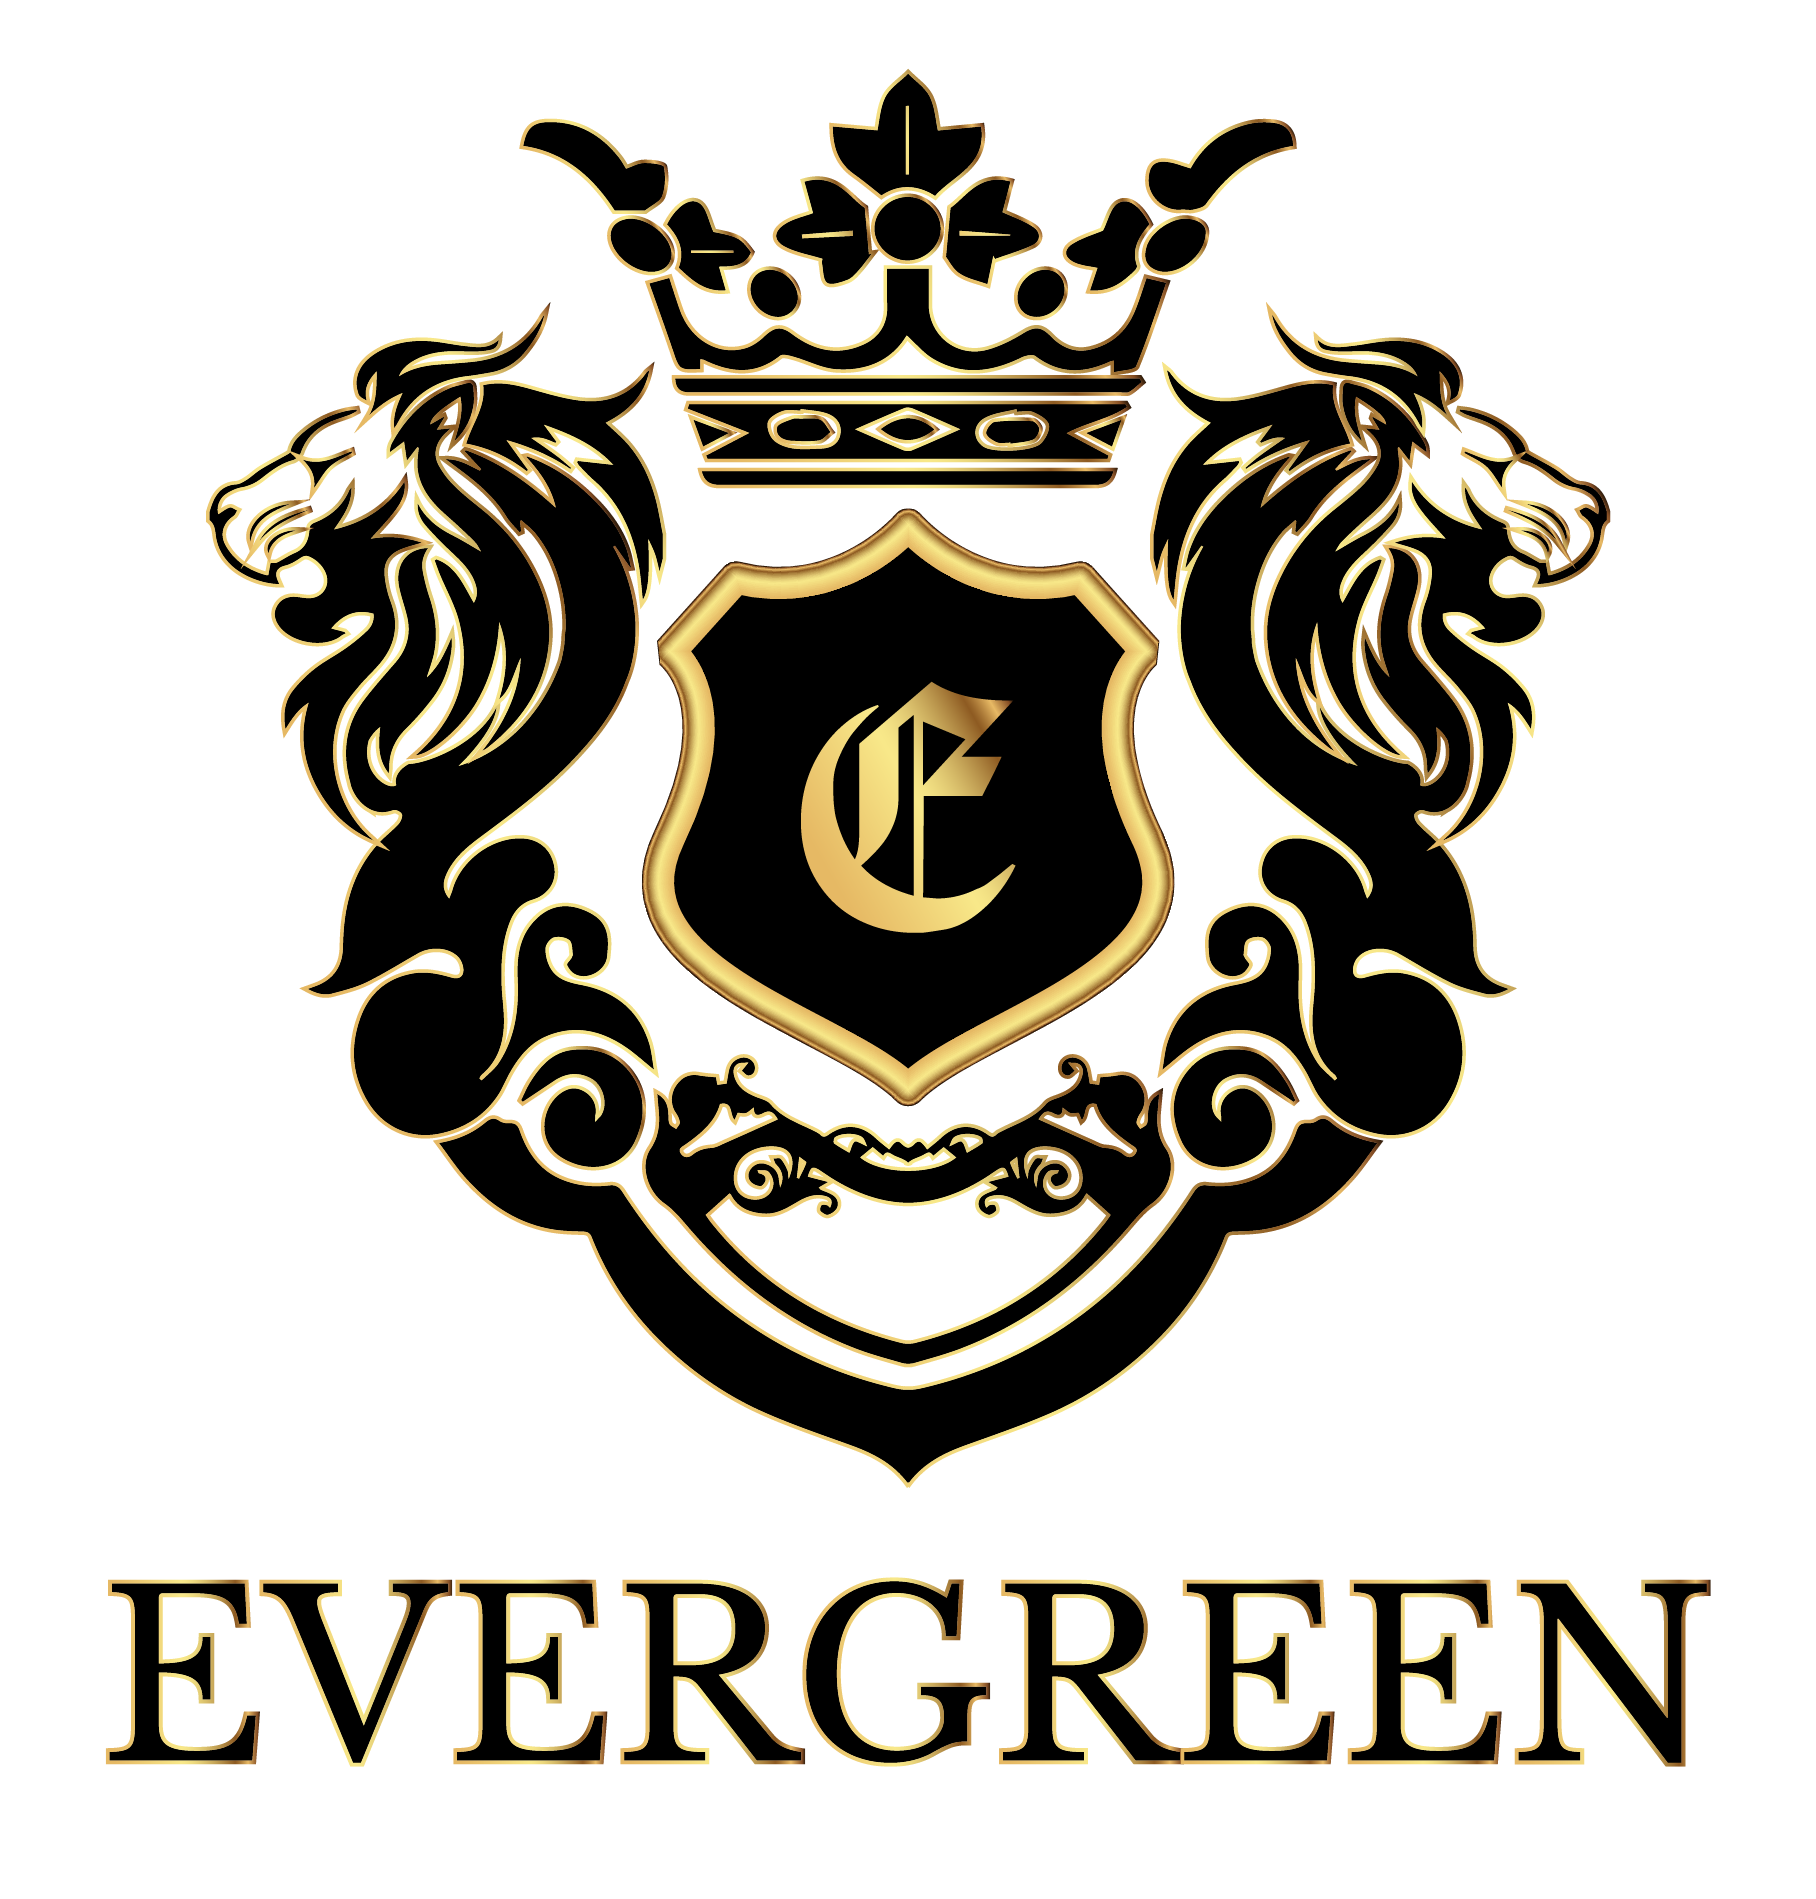 23 EVERGREEN-B1